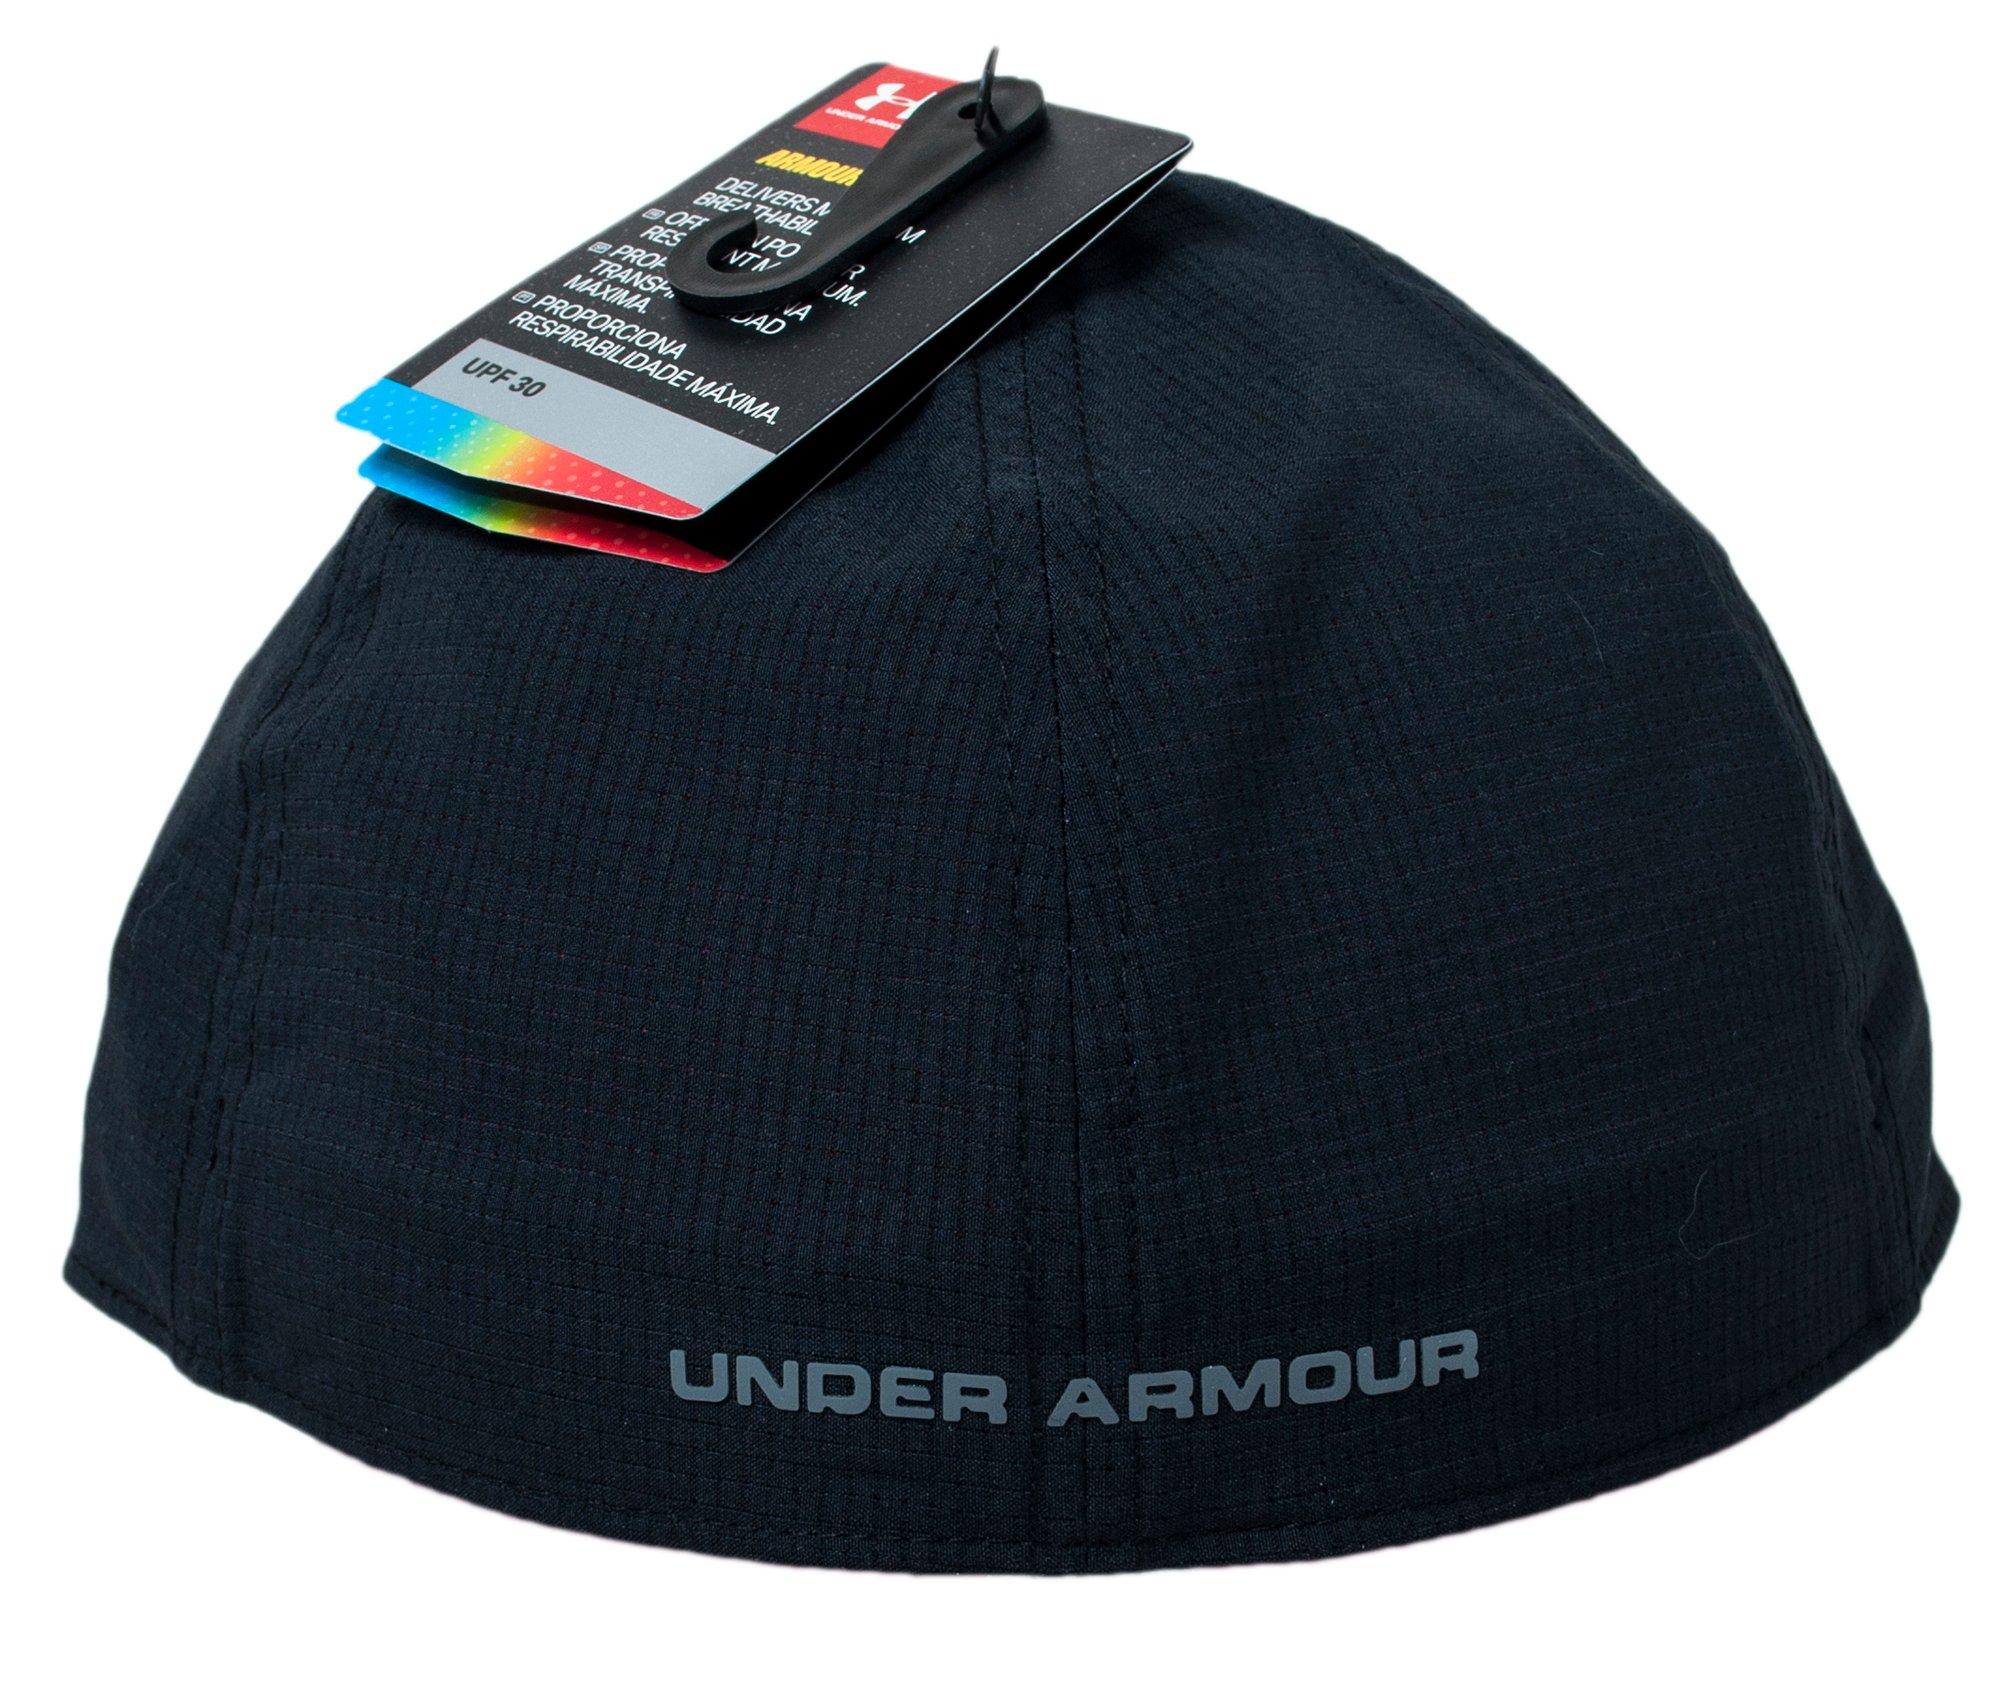 7419618fd61 ... UNDER ARMOUR czapka XL XXL ArmourVent HIT NA LATO ...